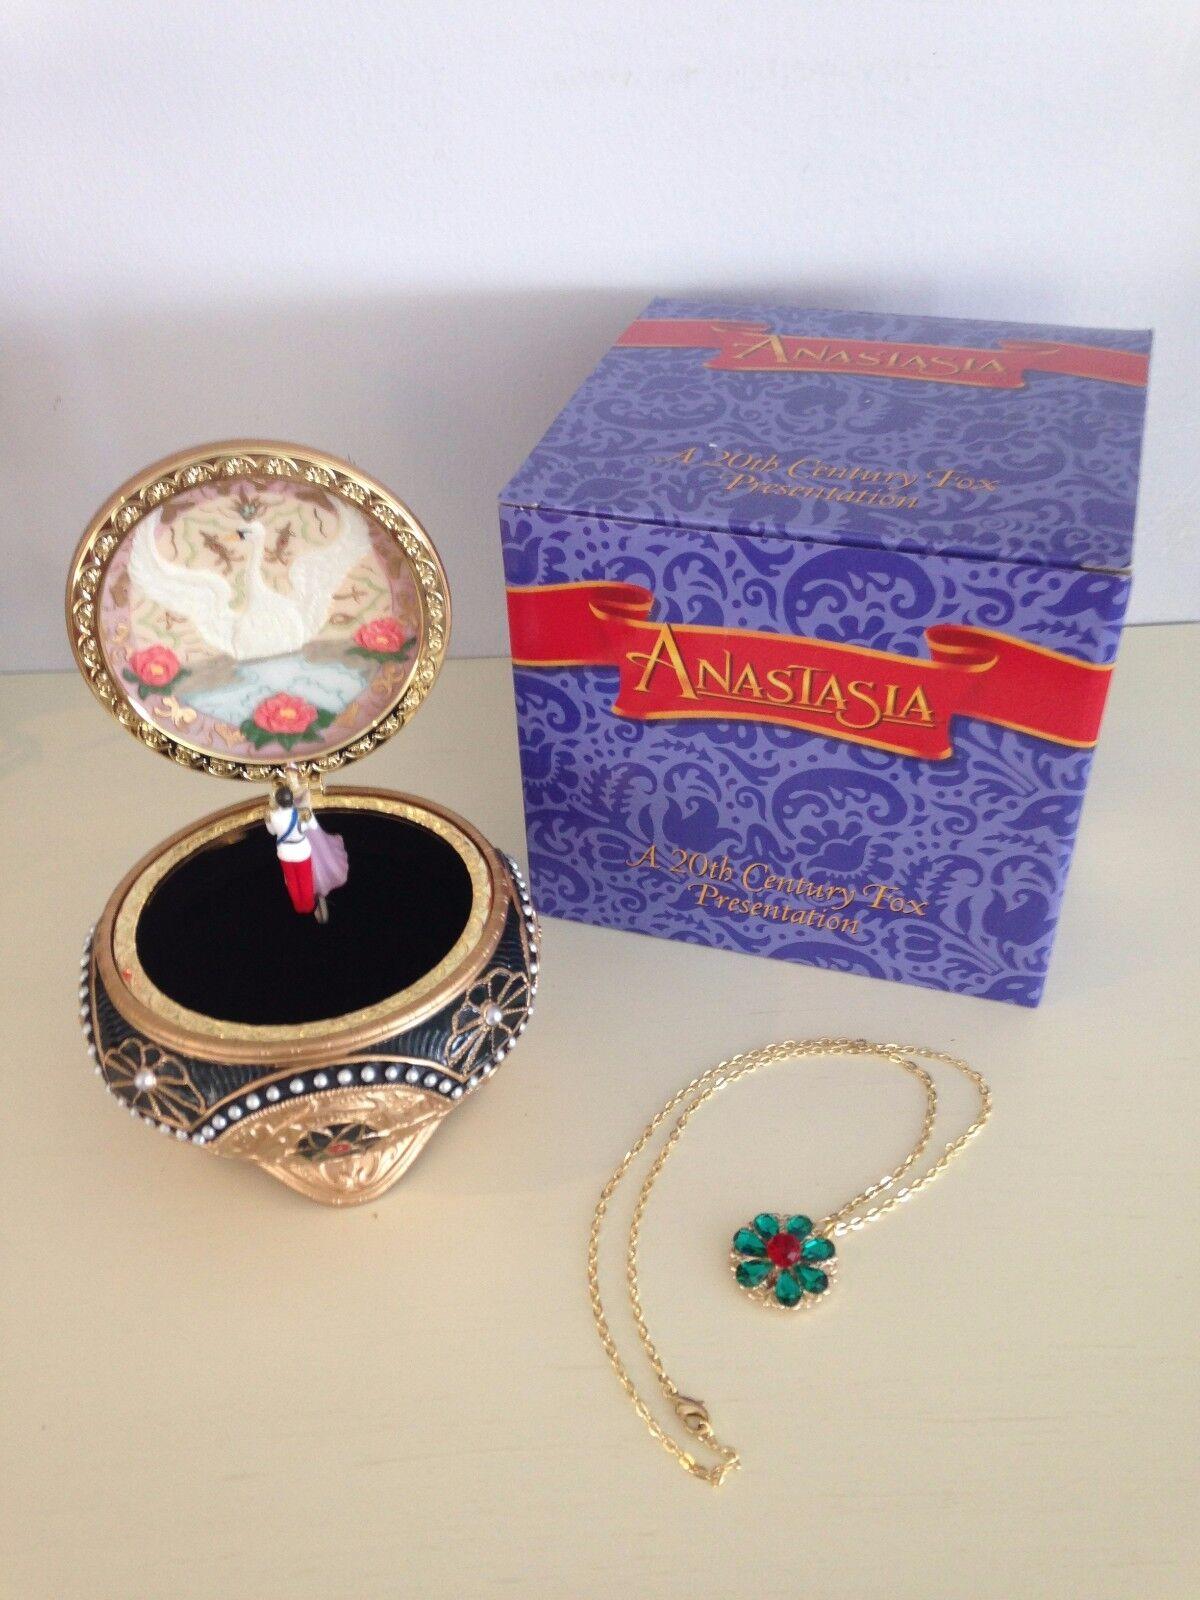 Anastasia Trinket Music Box with Necklace by The San Francisco Music Box Co. NIB